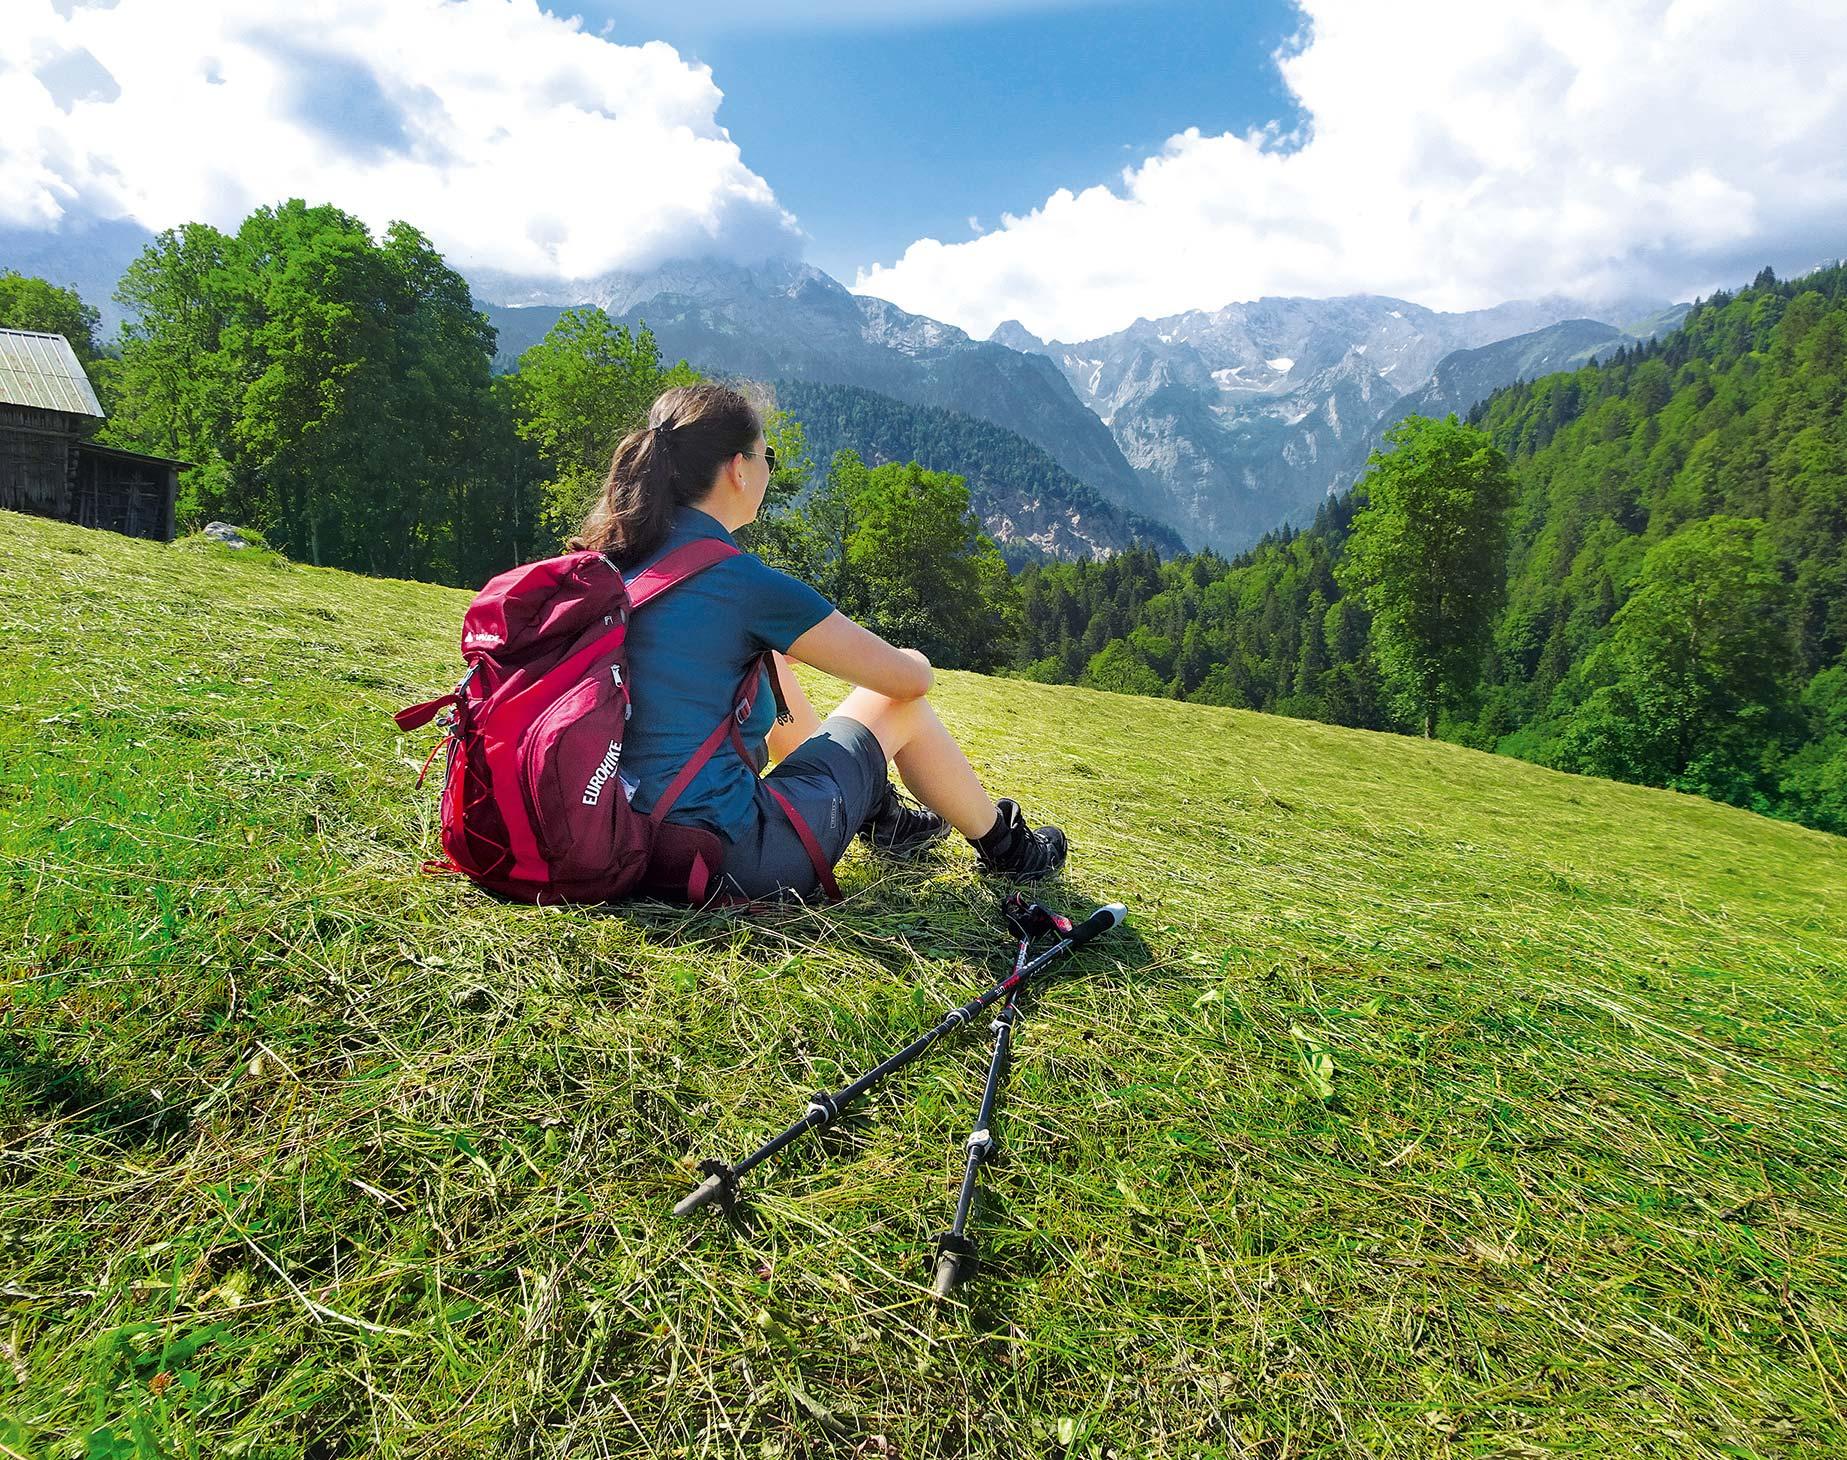 Mit Eurohike unkompliziert auf Wanderung gehen © Eurohike